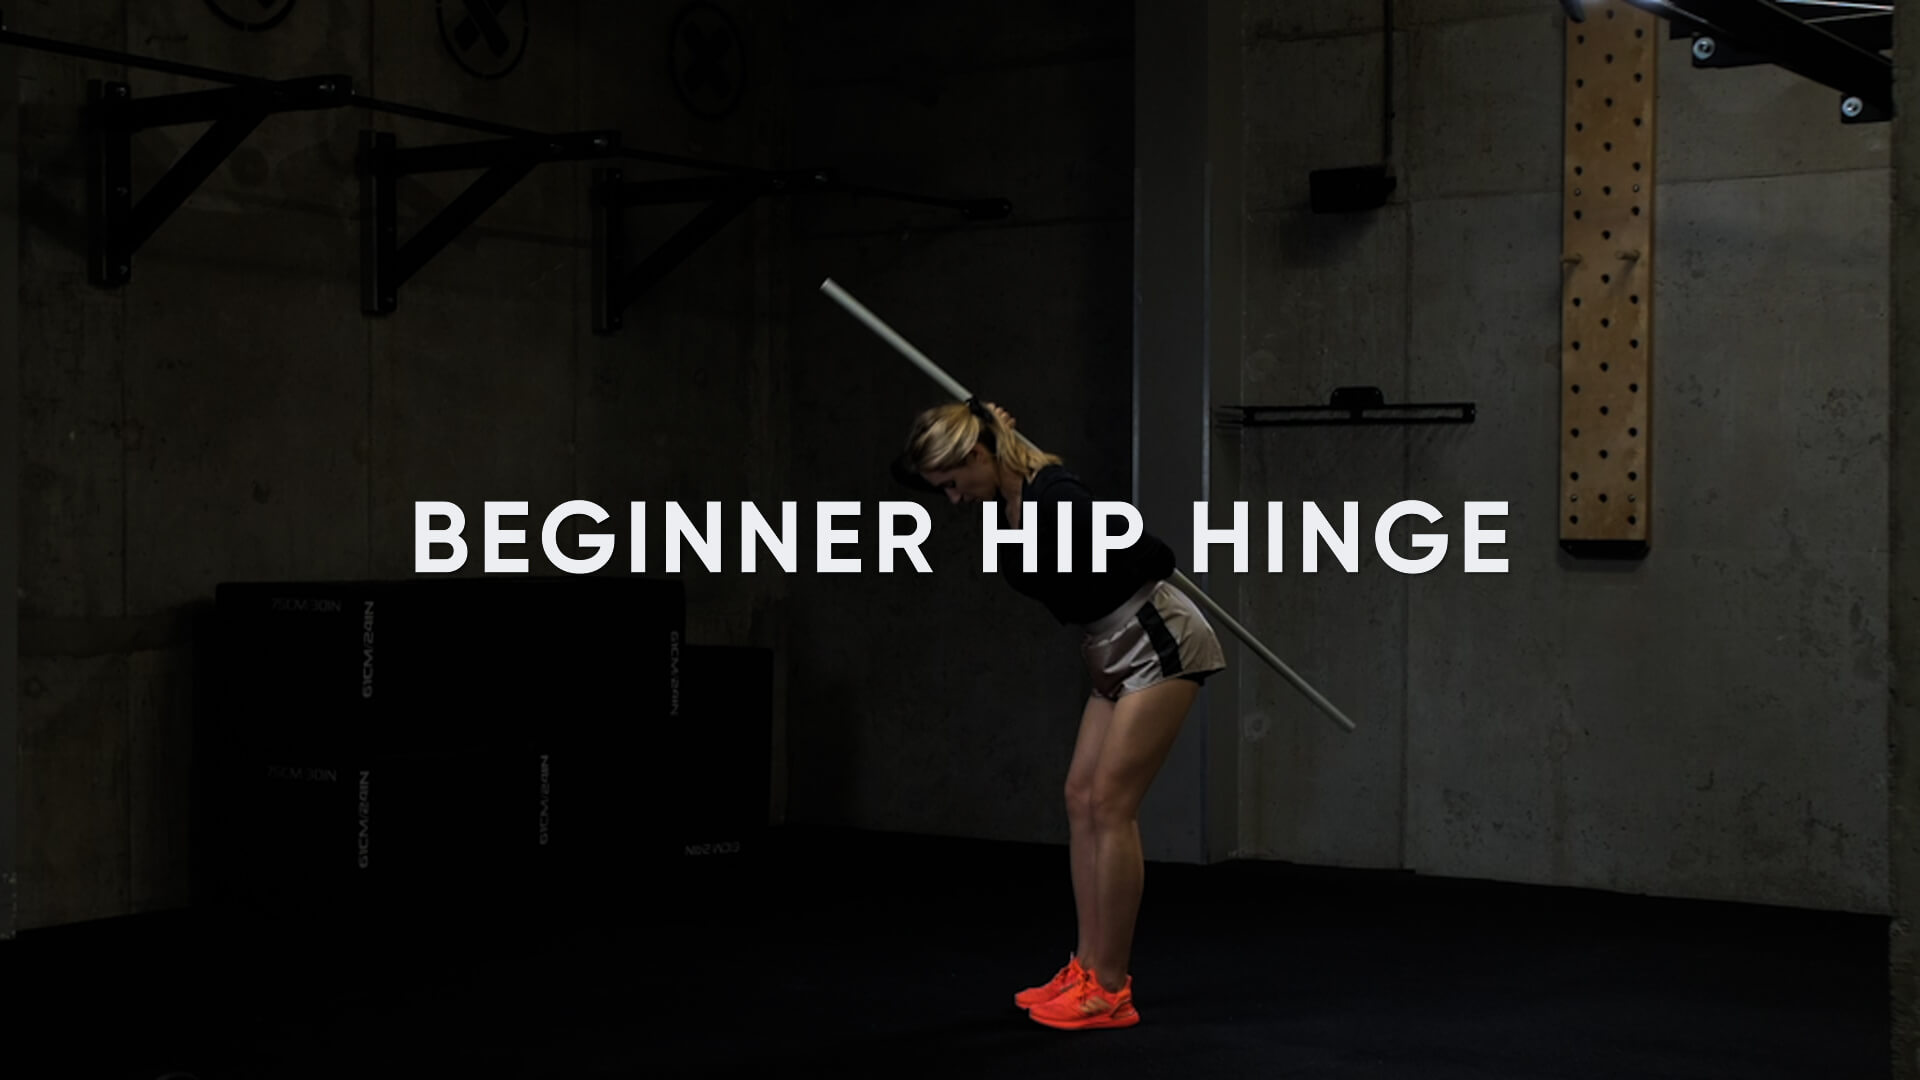 Beginner Hip Hinge